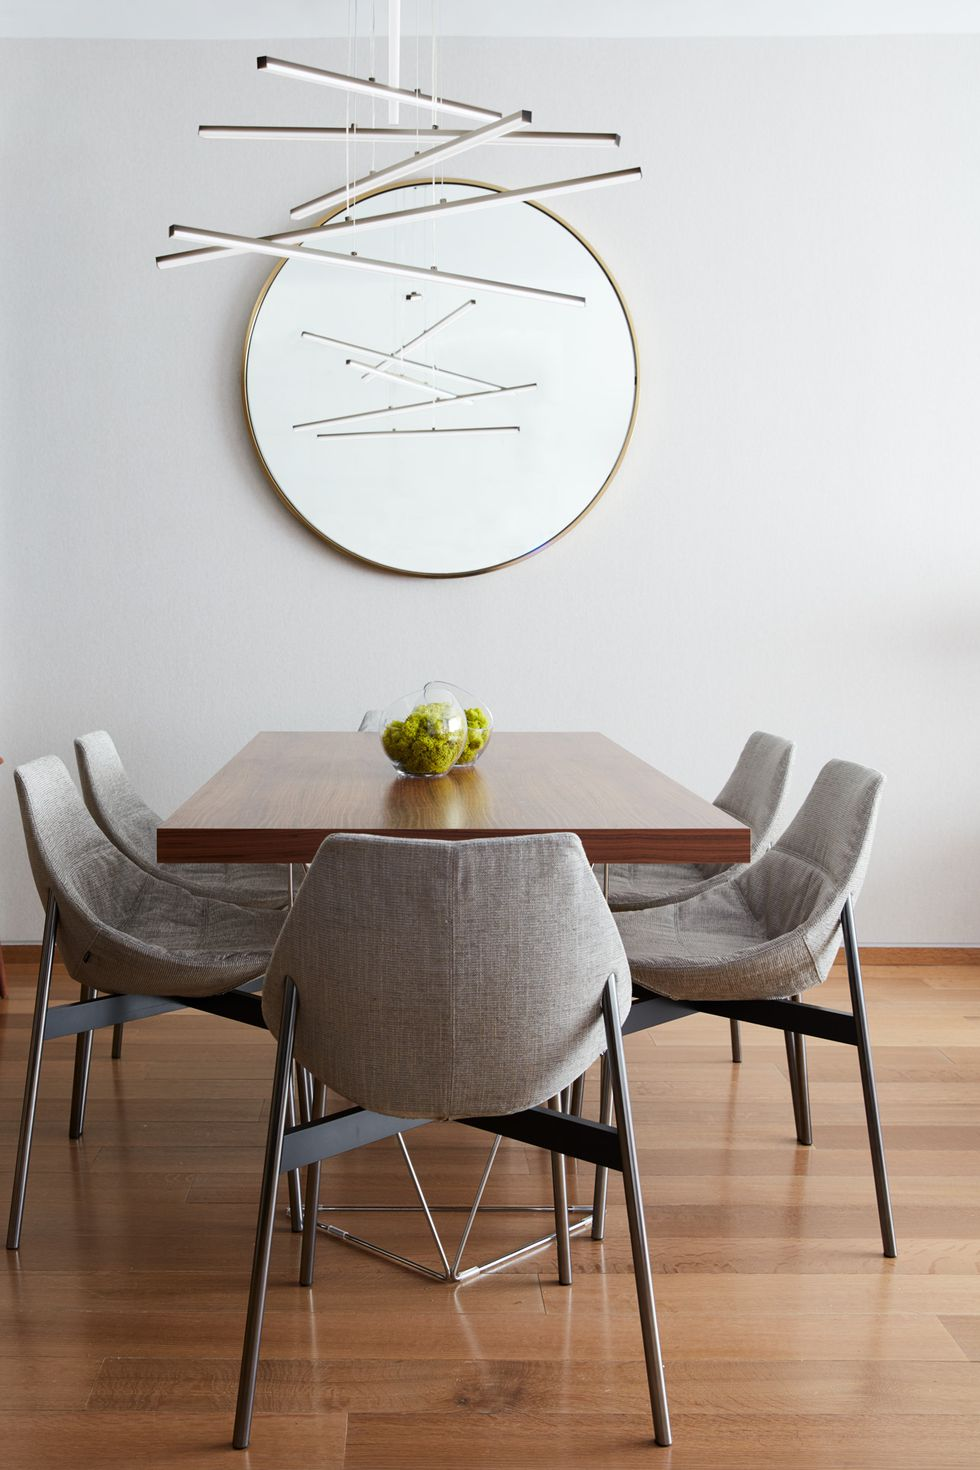 2019 Interior Design Trends Light Hardwood Floors.jpg